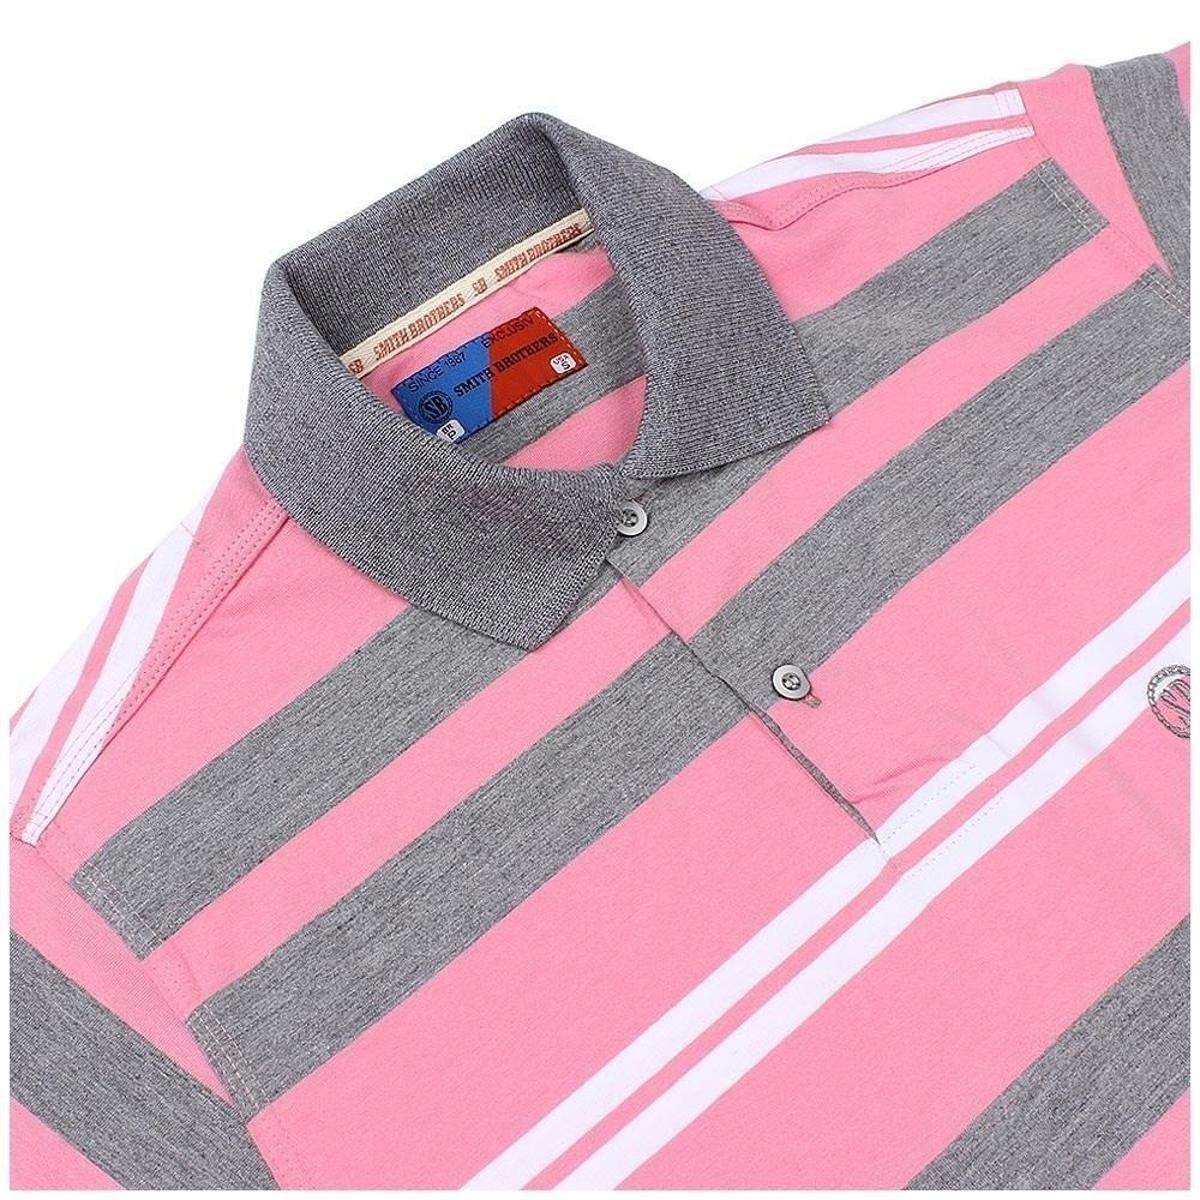 Camisa Polo Smith Brothers Listrada Masculina - Rosa - Compre Agora ... 6791c5e3dc7db